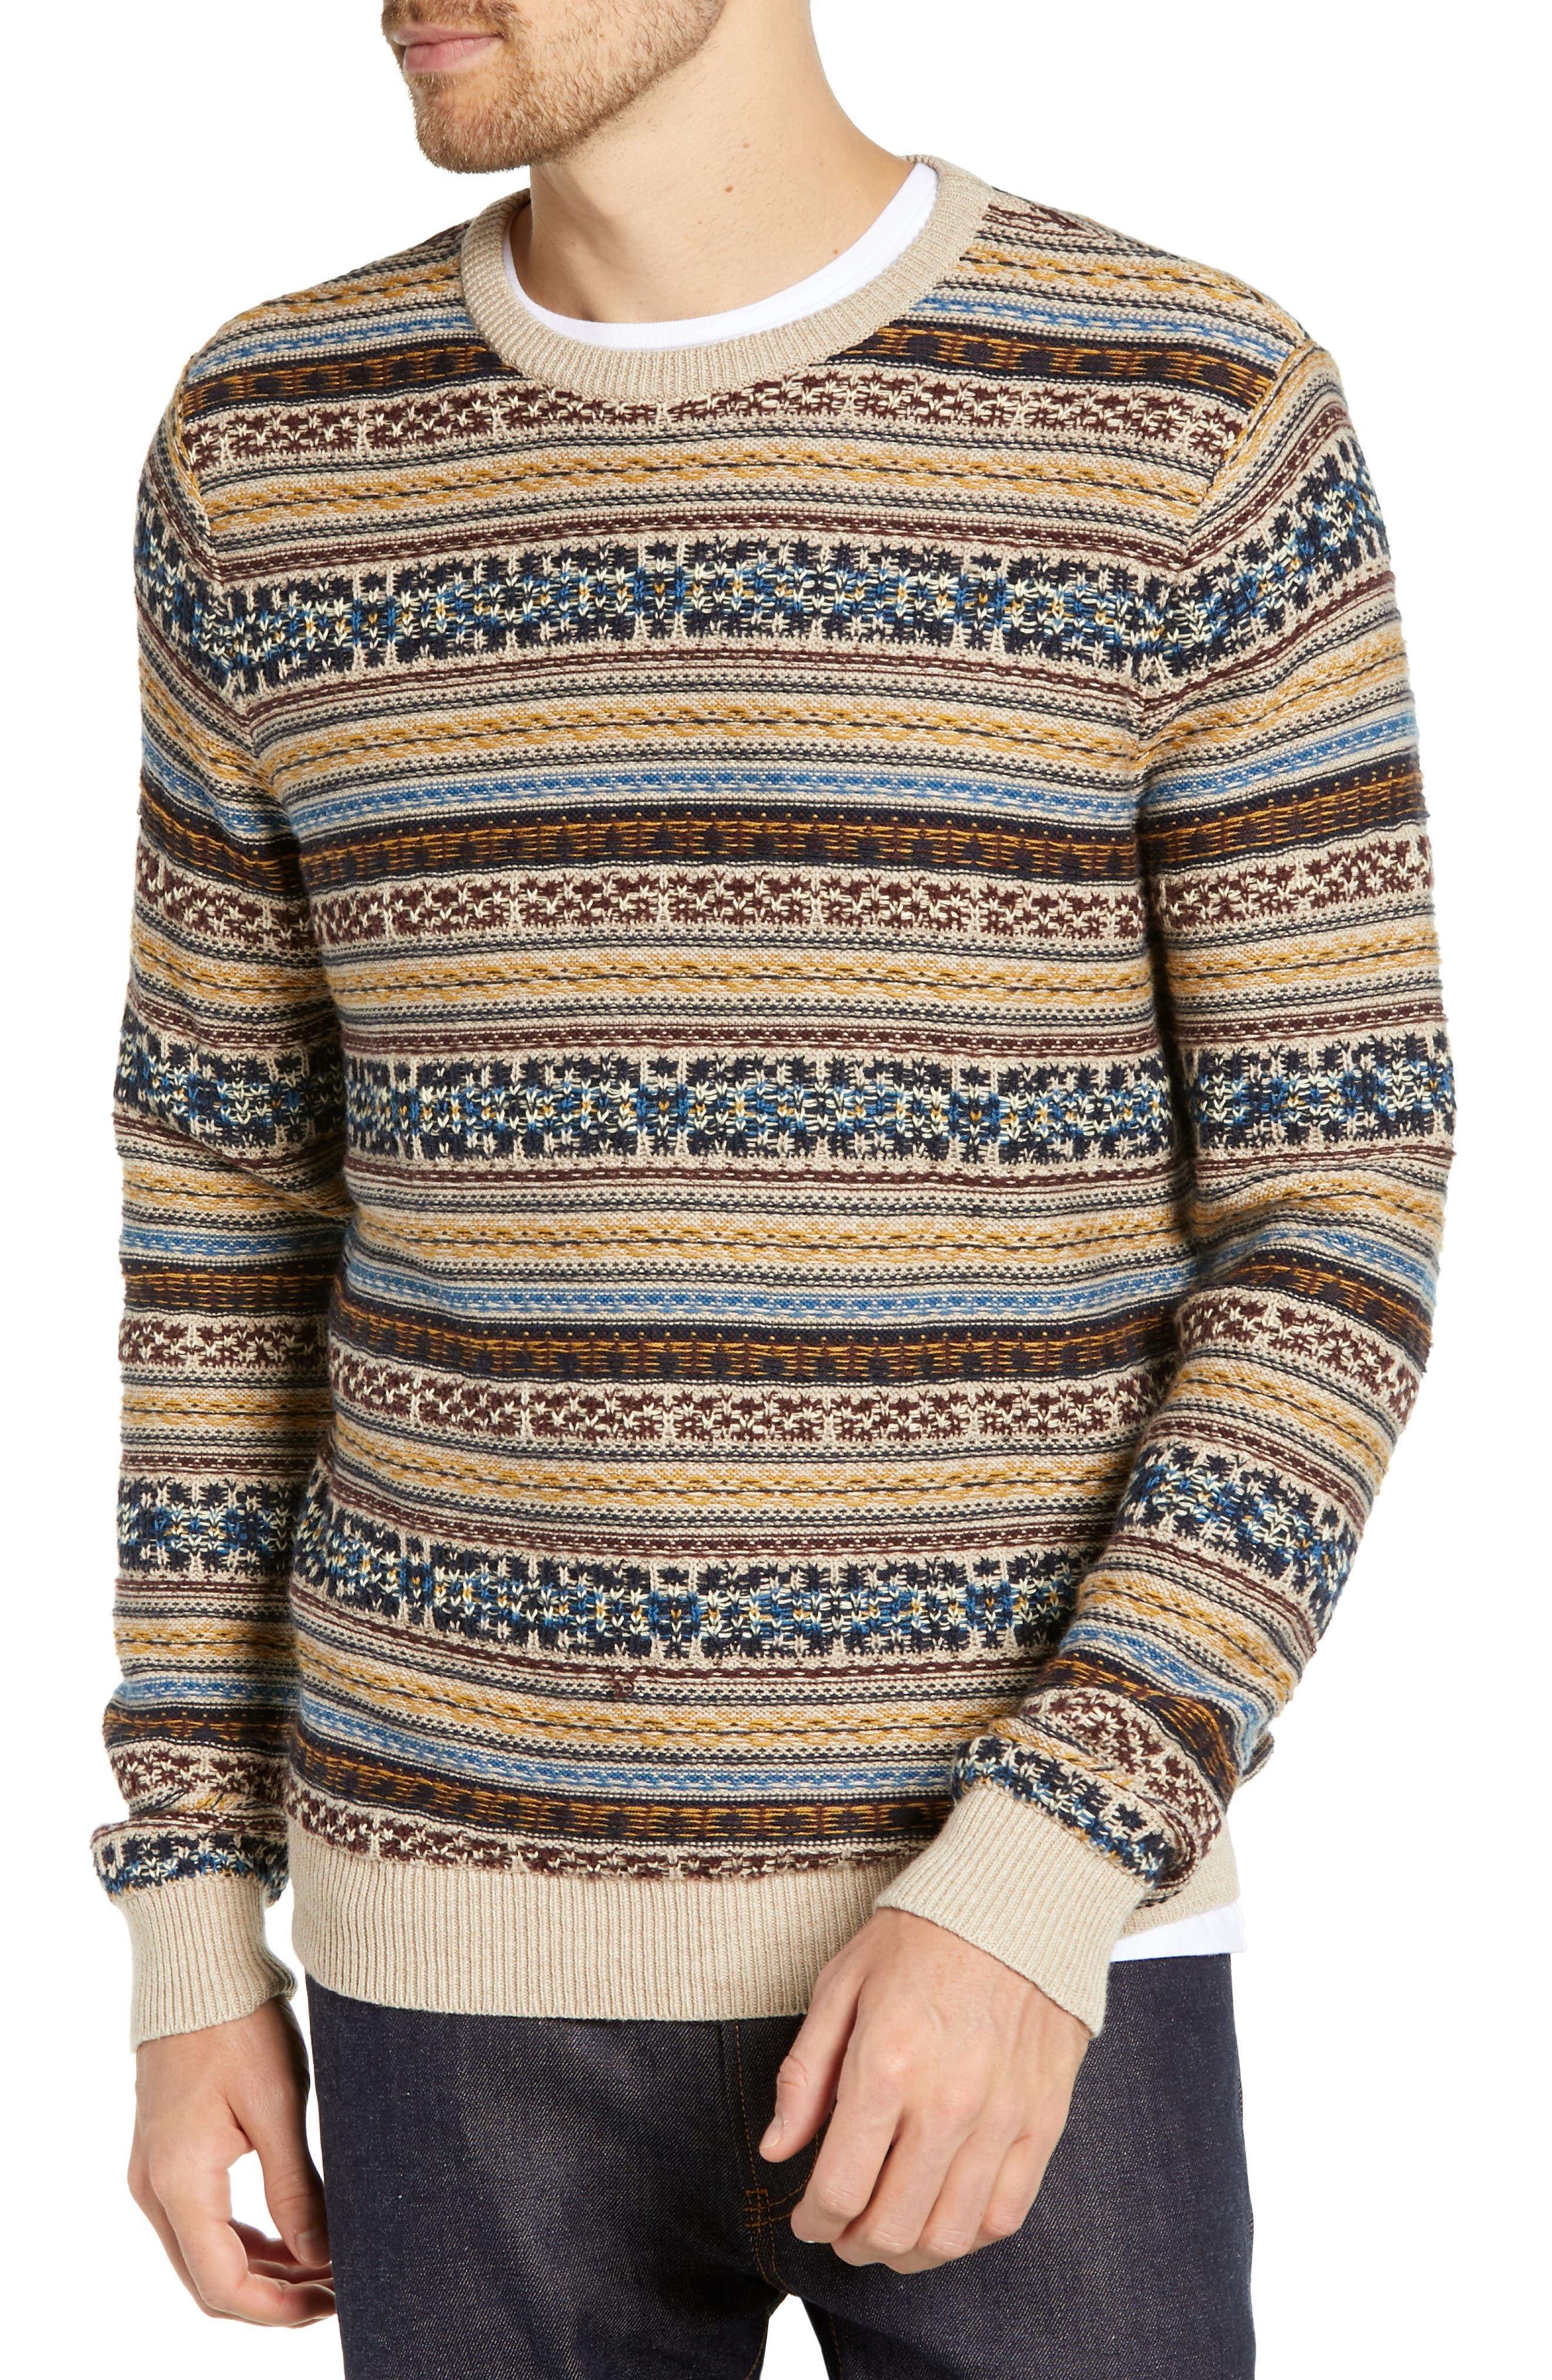 Regular Fit Fair Isle Crewneck Sweater,                             Main thumbnail 1, color,                             BROWN SIENA FAIRISLE